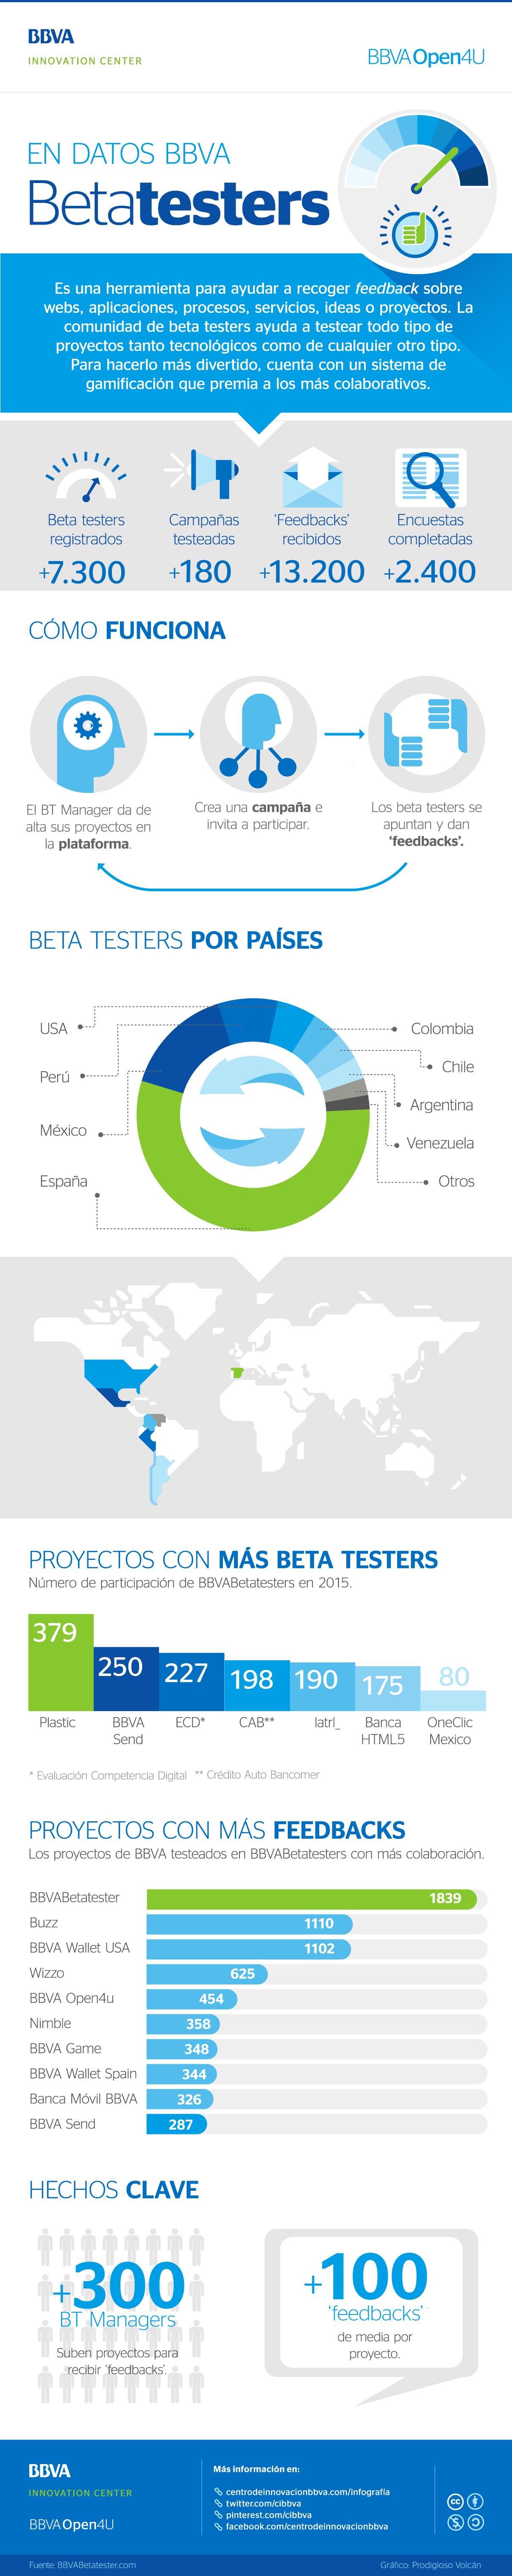 Infografía: BBVABetatesters, en datos